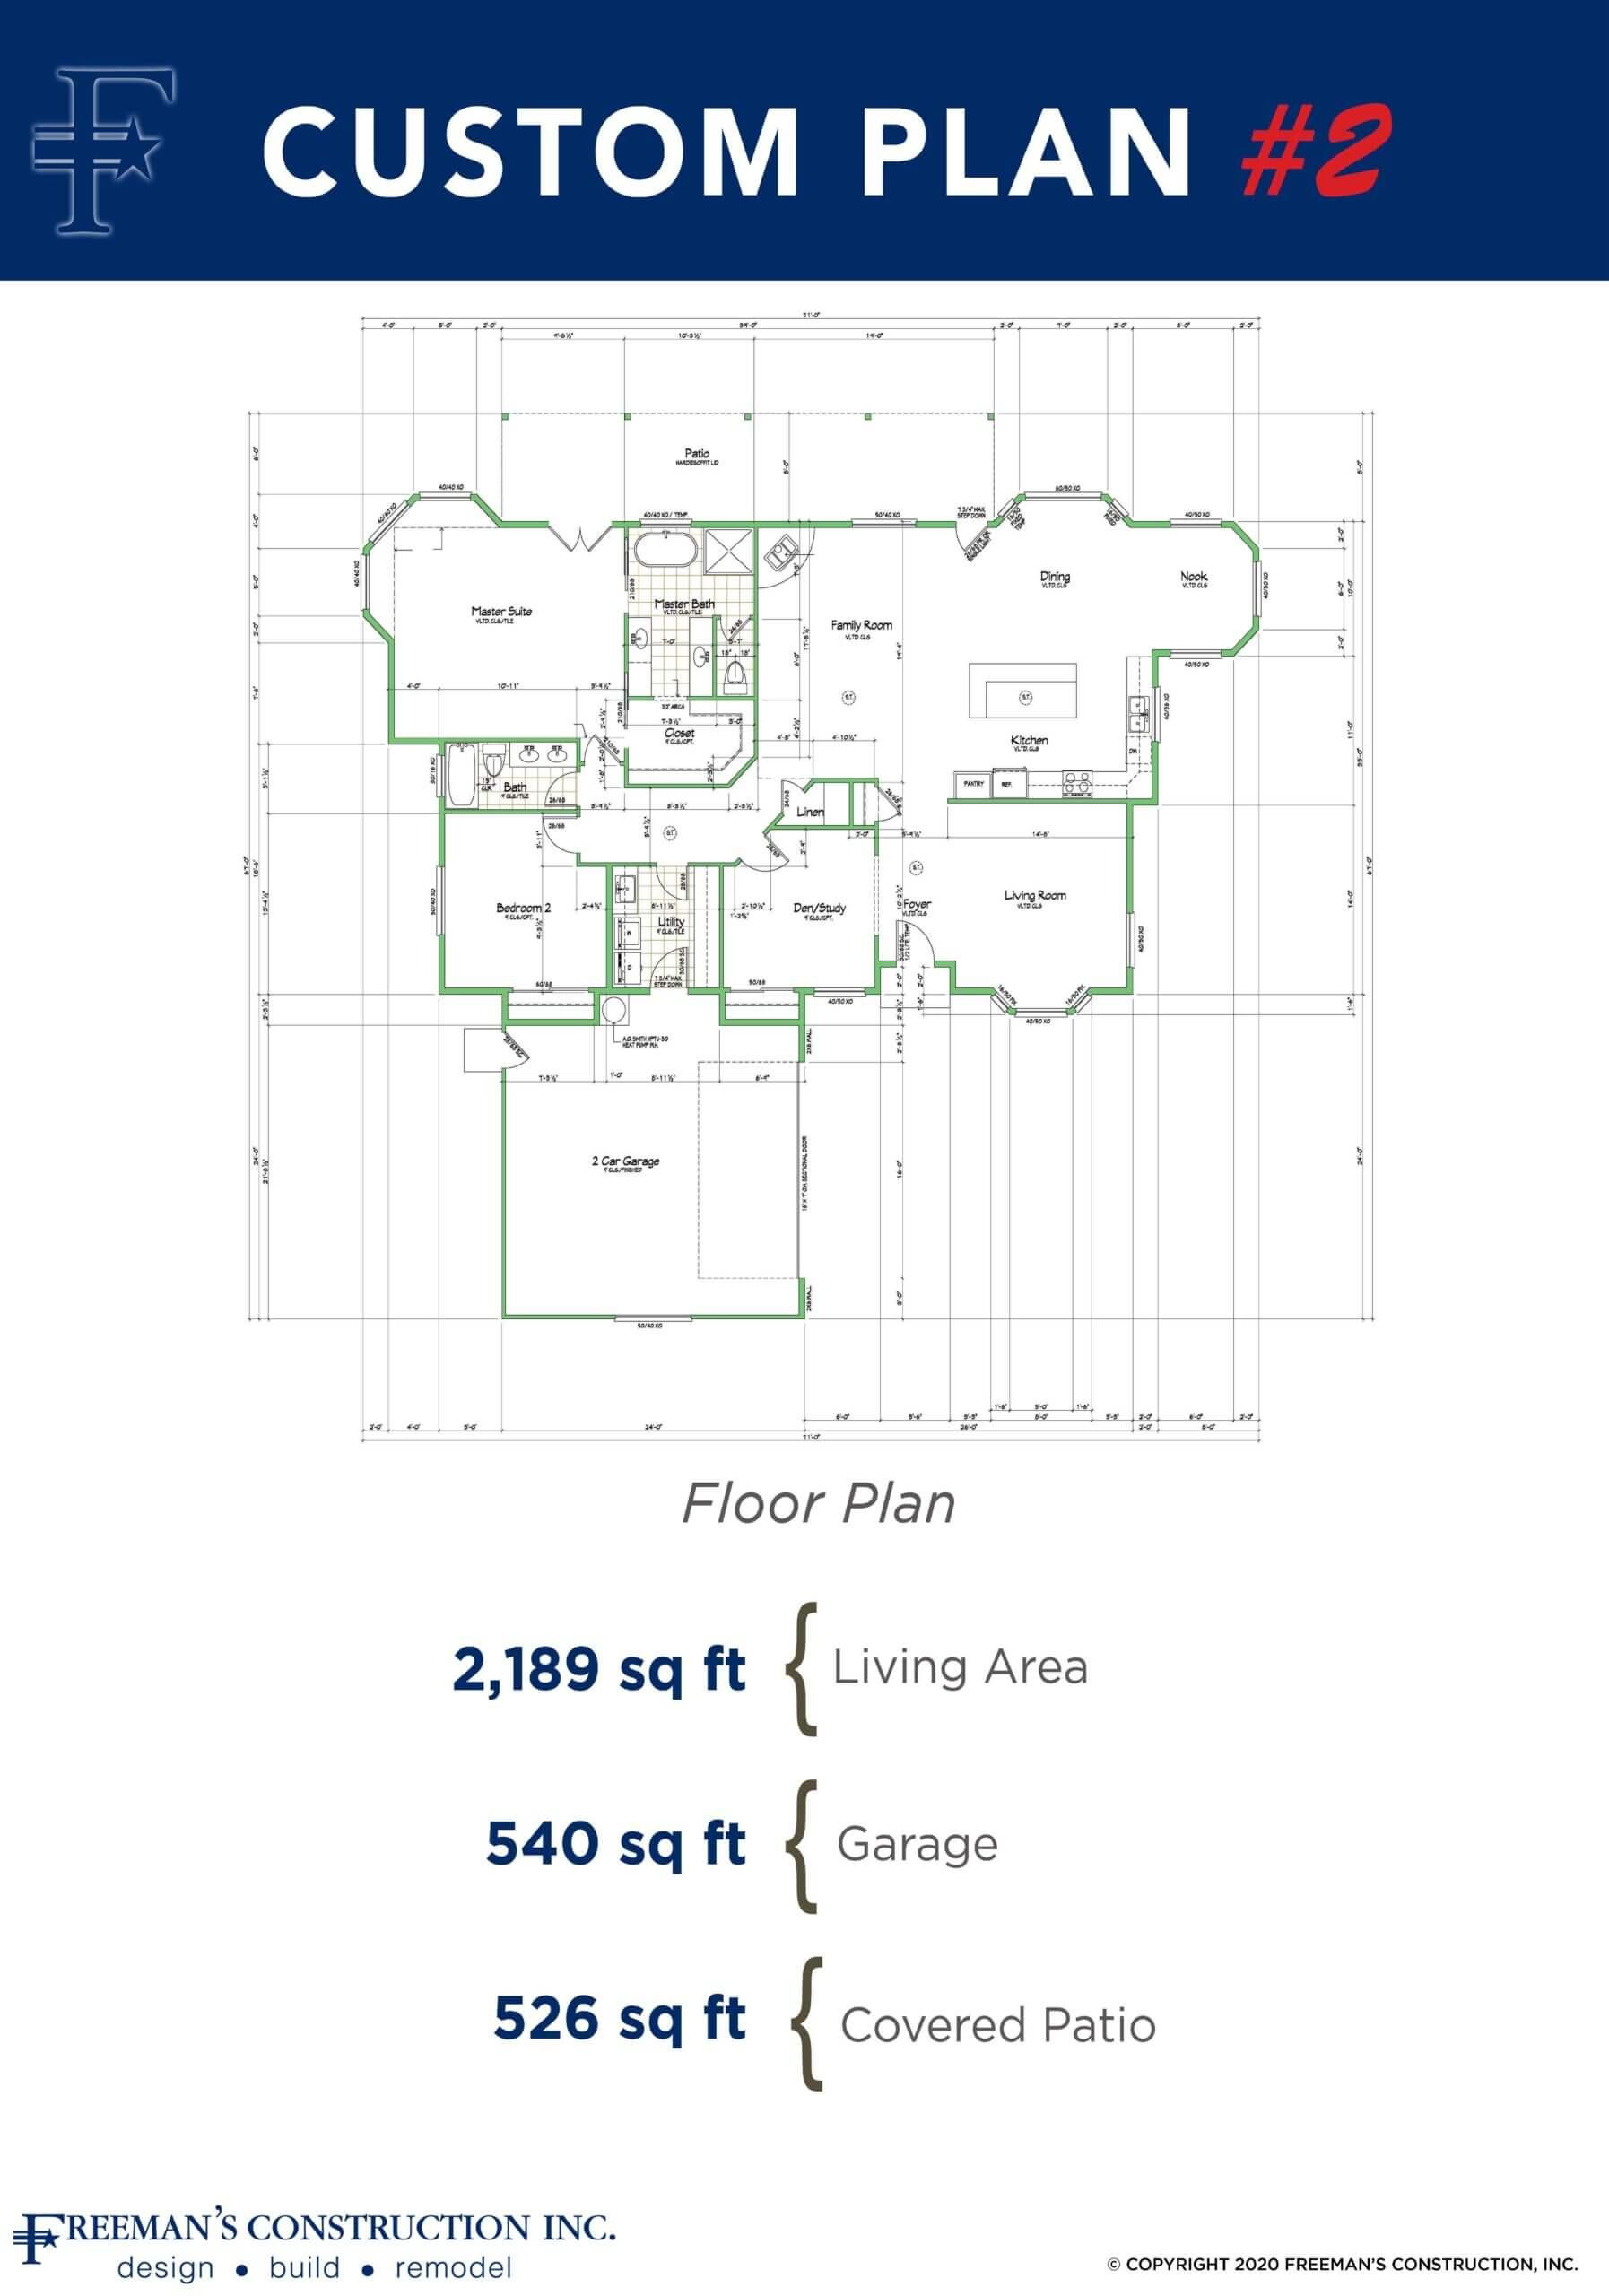 custom-home-floor-plan-2-in-ramona-ca-by-freemans-construction-inc